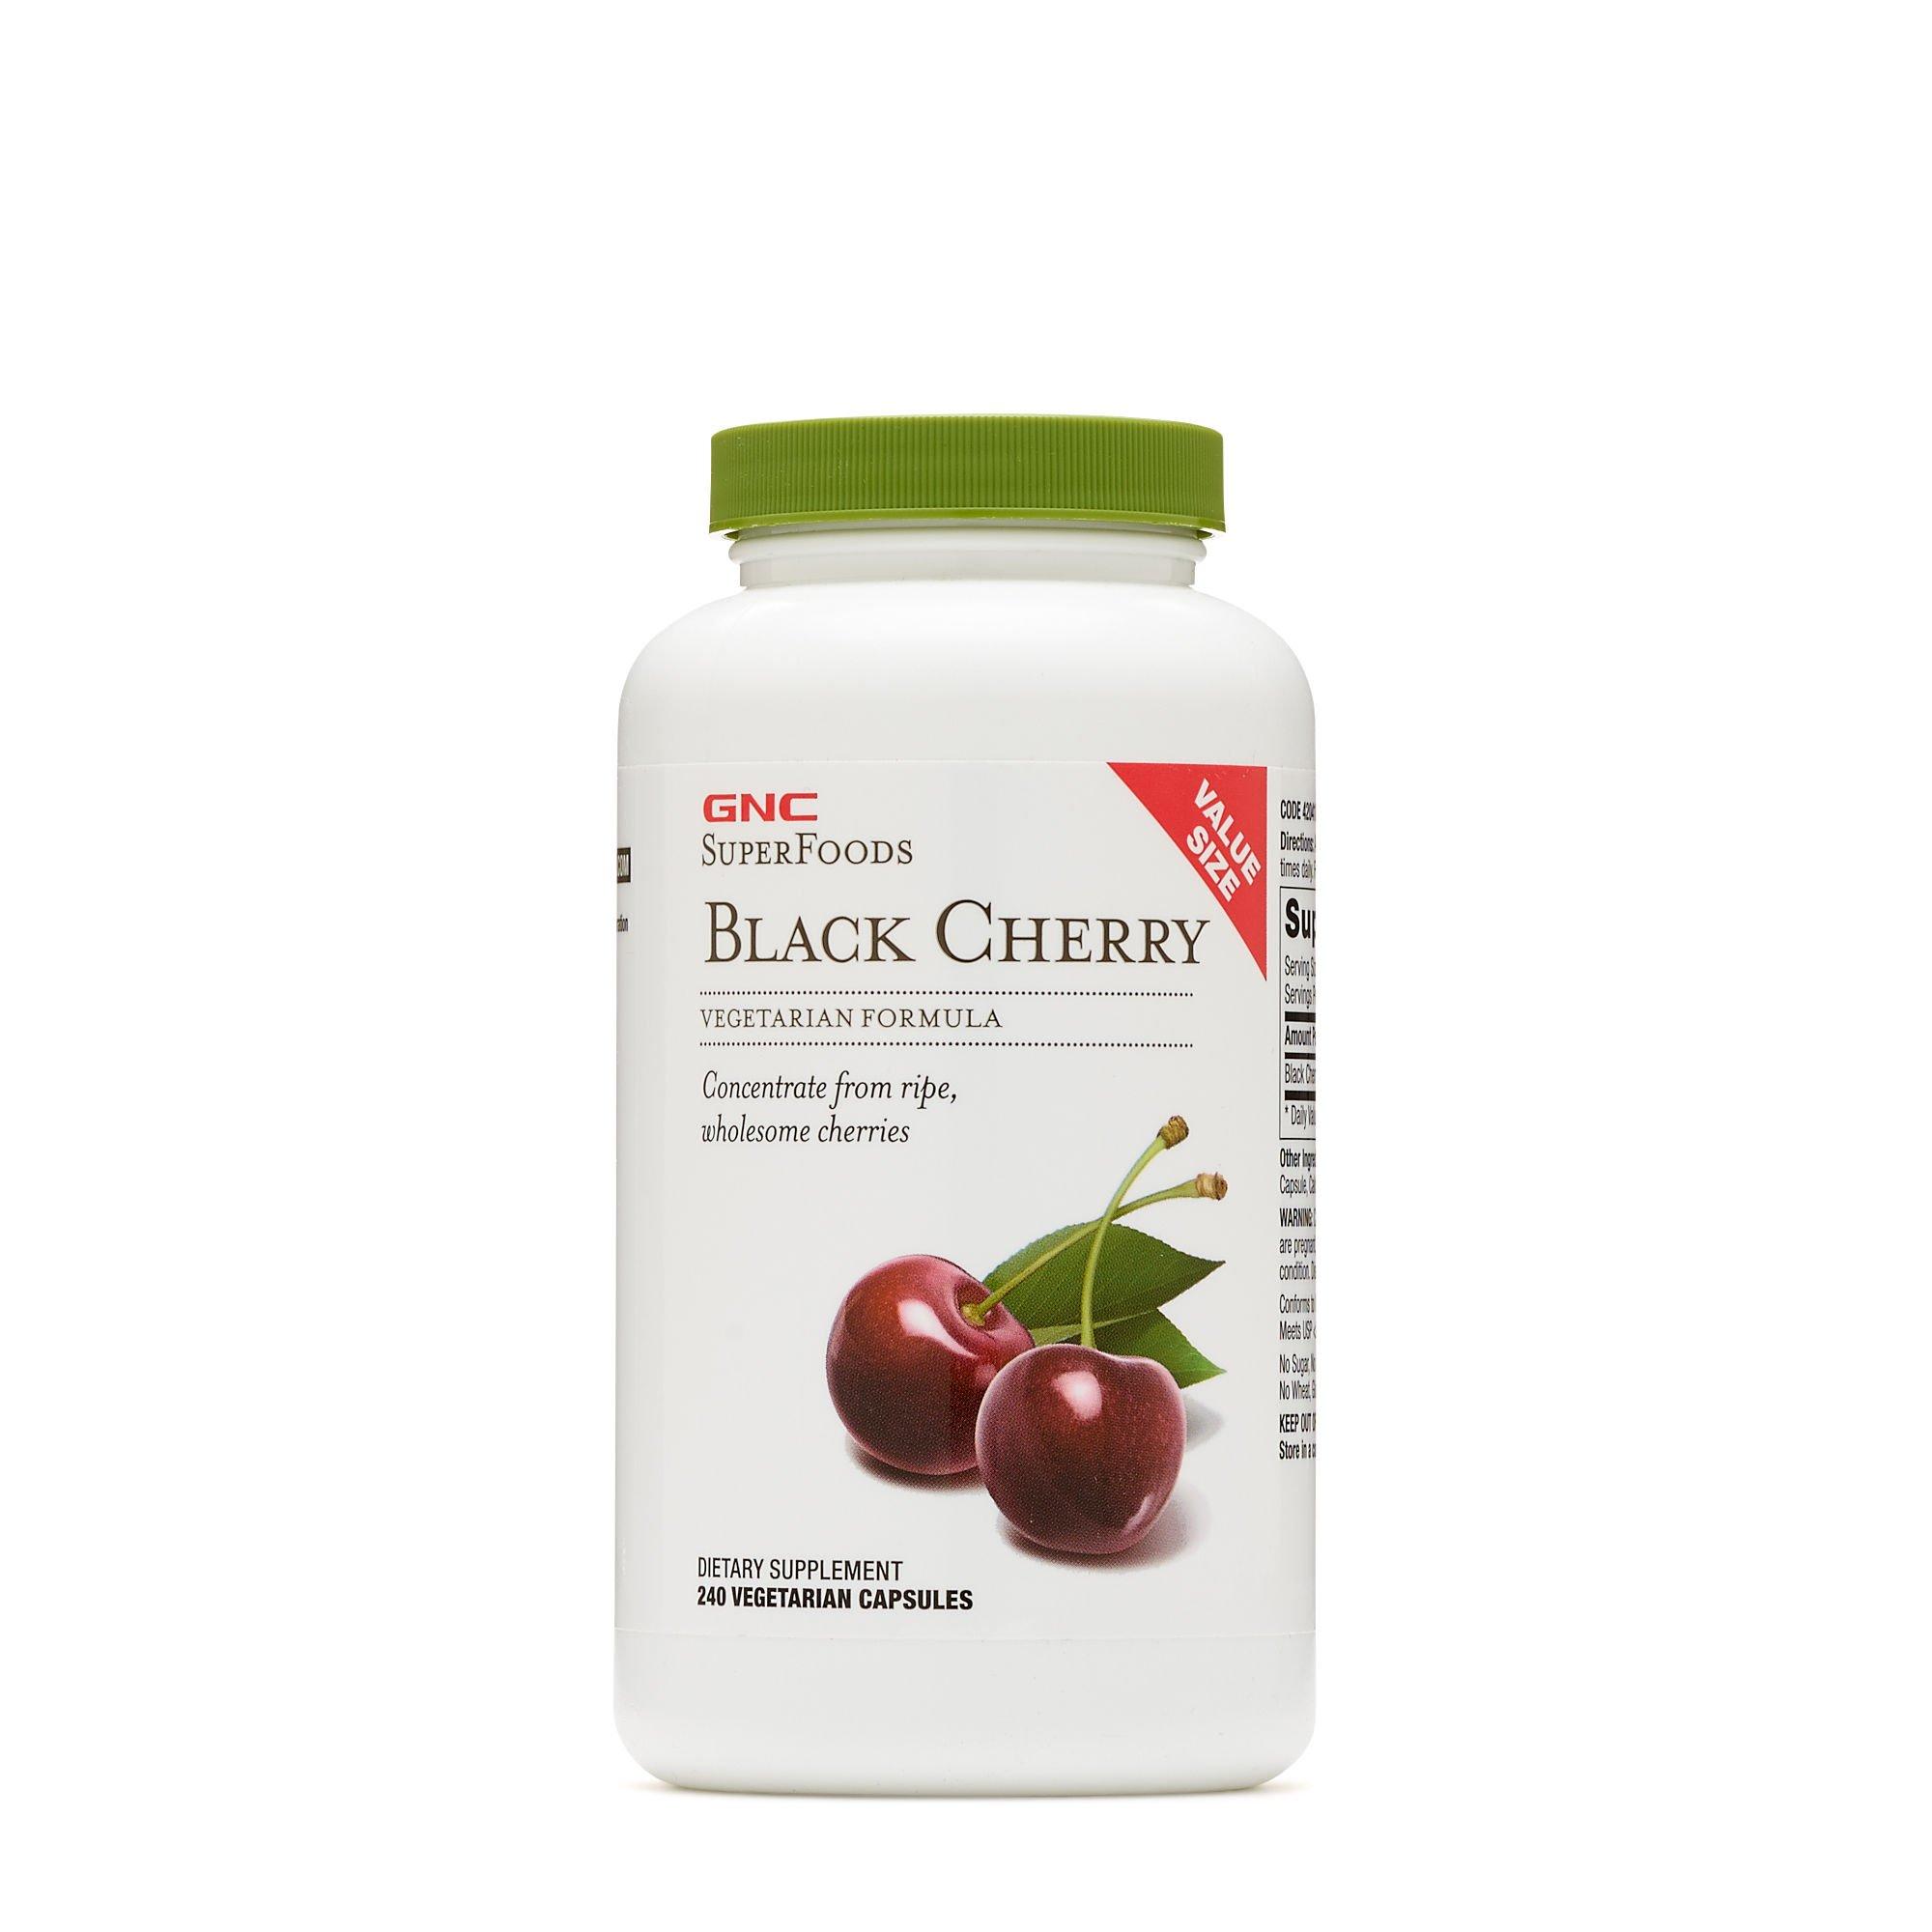 Amazon.com: GNC SuperFoods Apple Cider Vinegar: Health